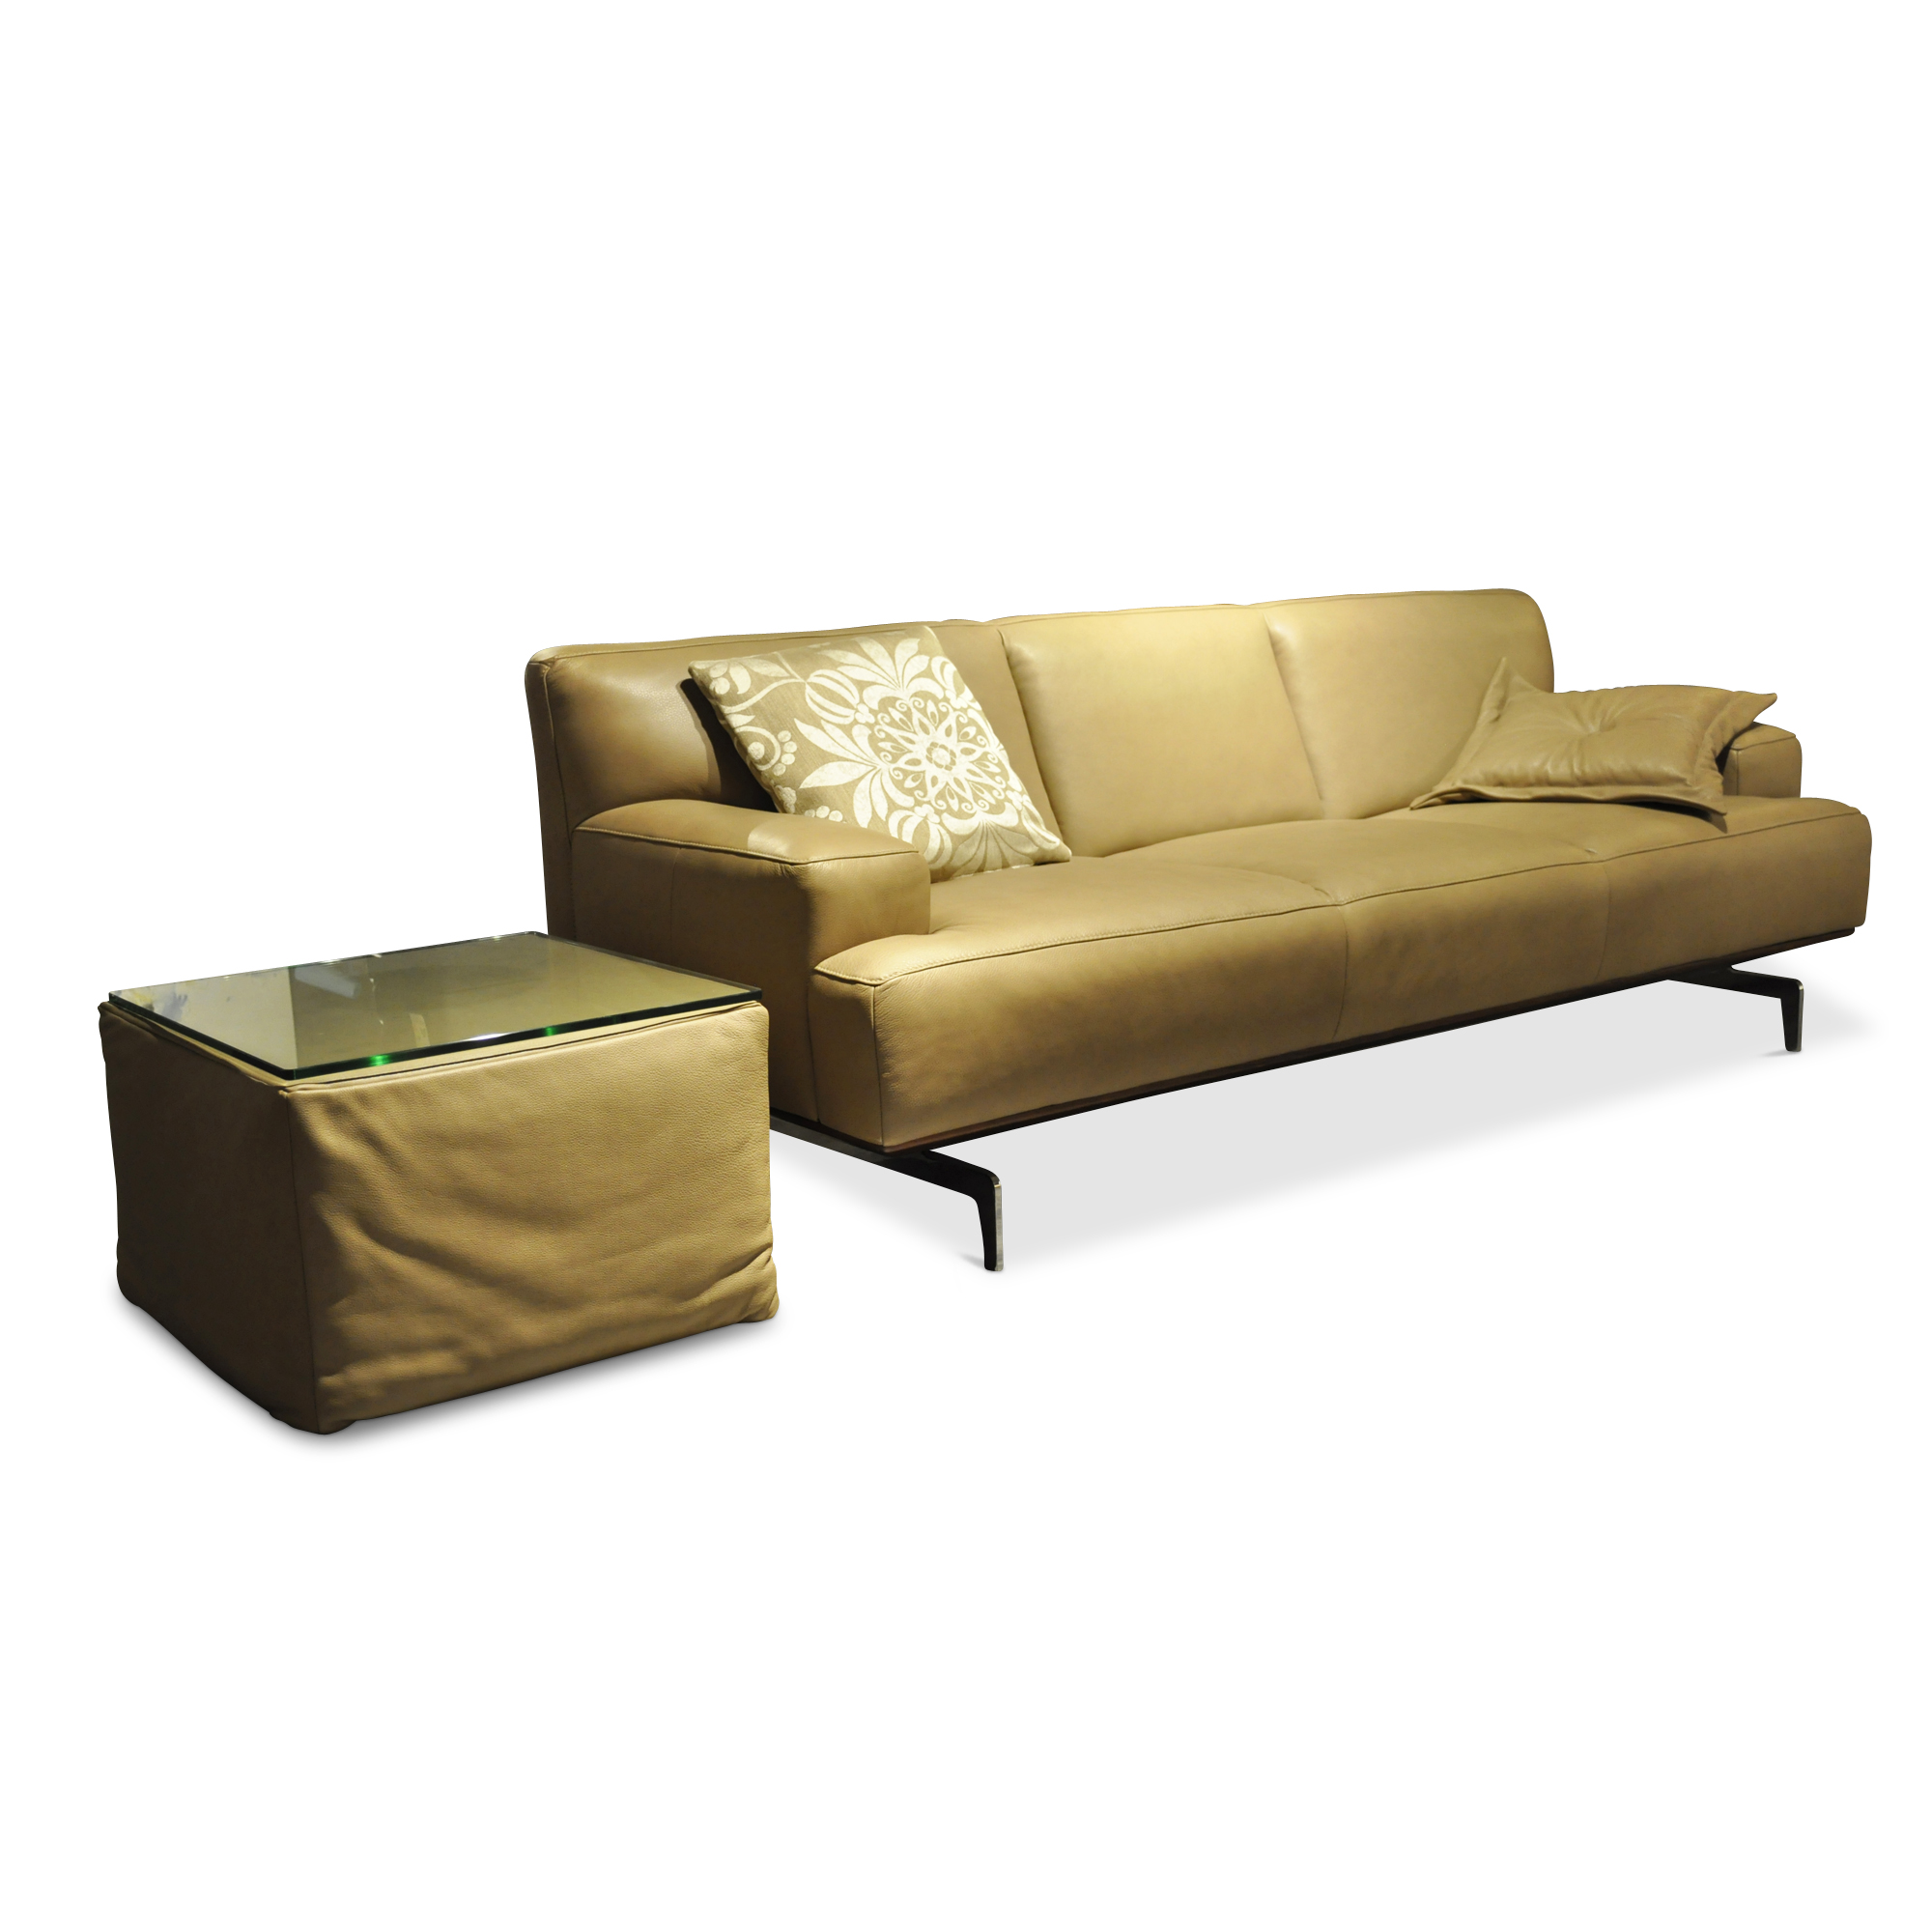 w schillig sofa affordable softy plus von willi schillig. Black Bedroom Furniture Sets. Home Design Ideas